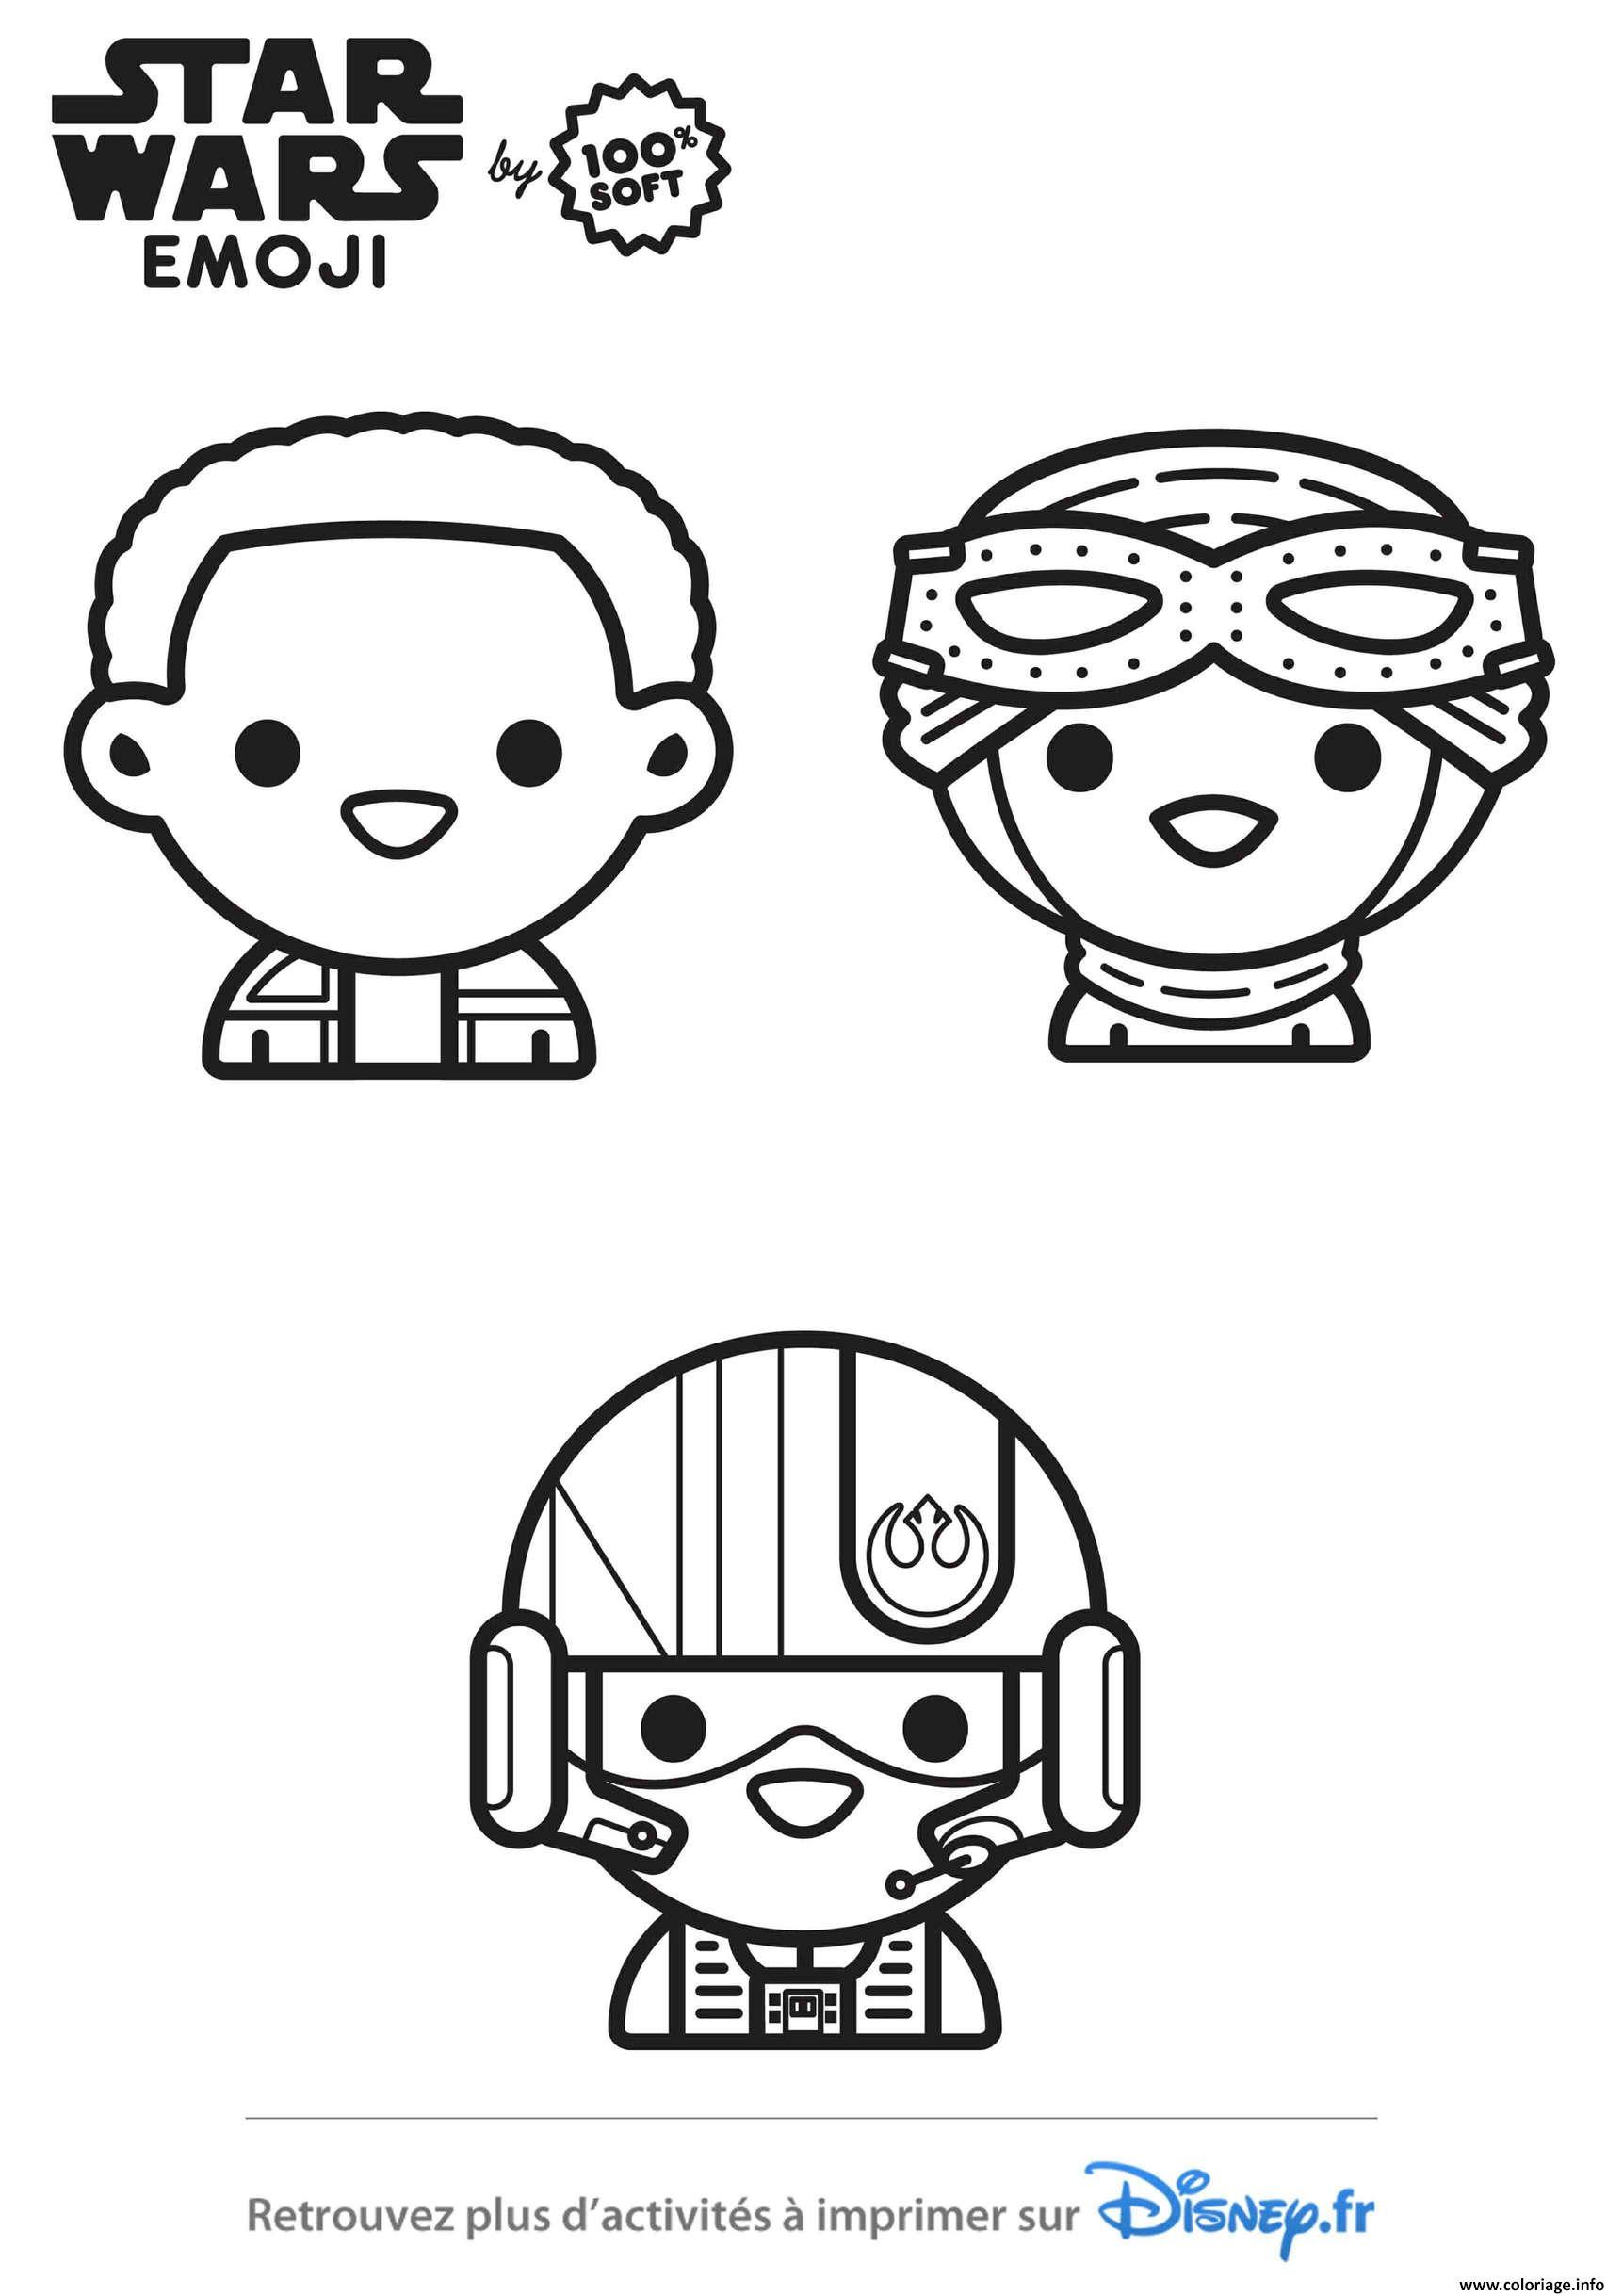 Dessin star wars pilotes emoji Coloriage Gratuit à Imprimer